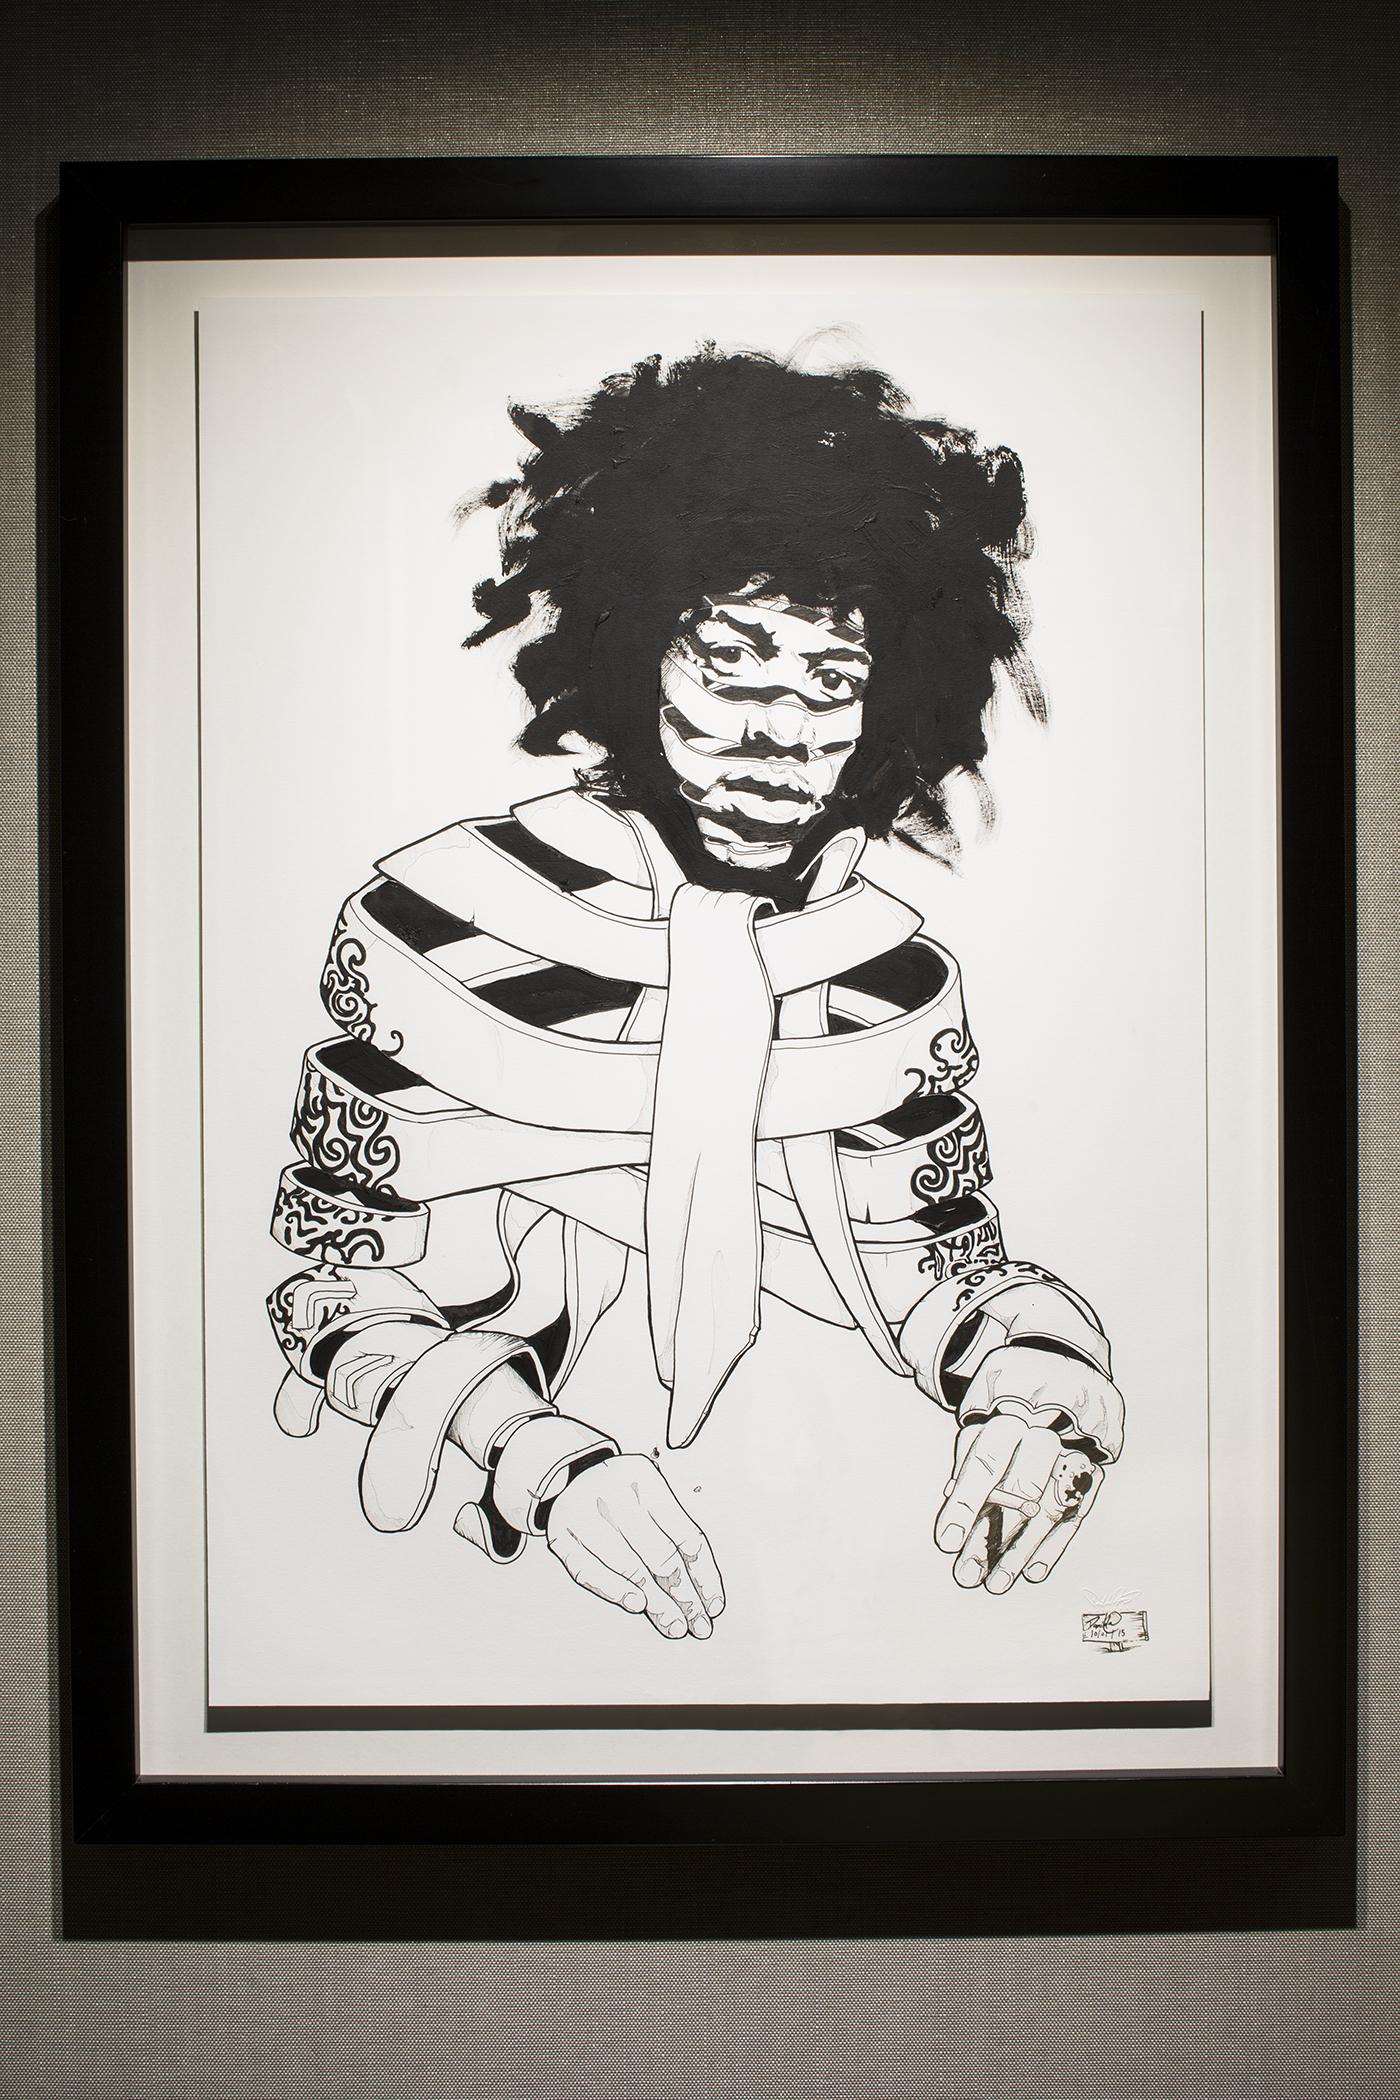 Artwork – Jimi Hendrix